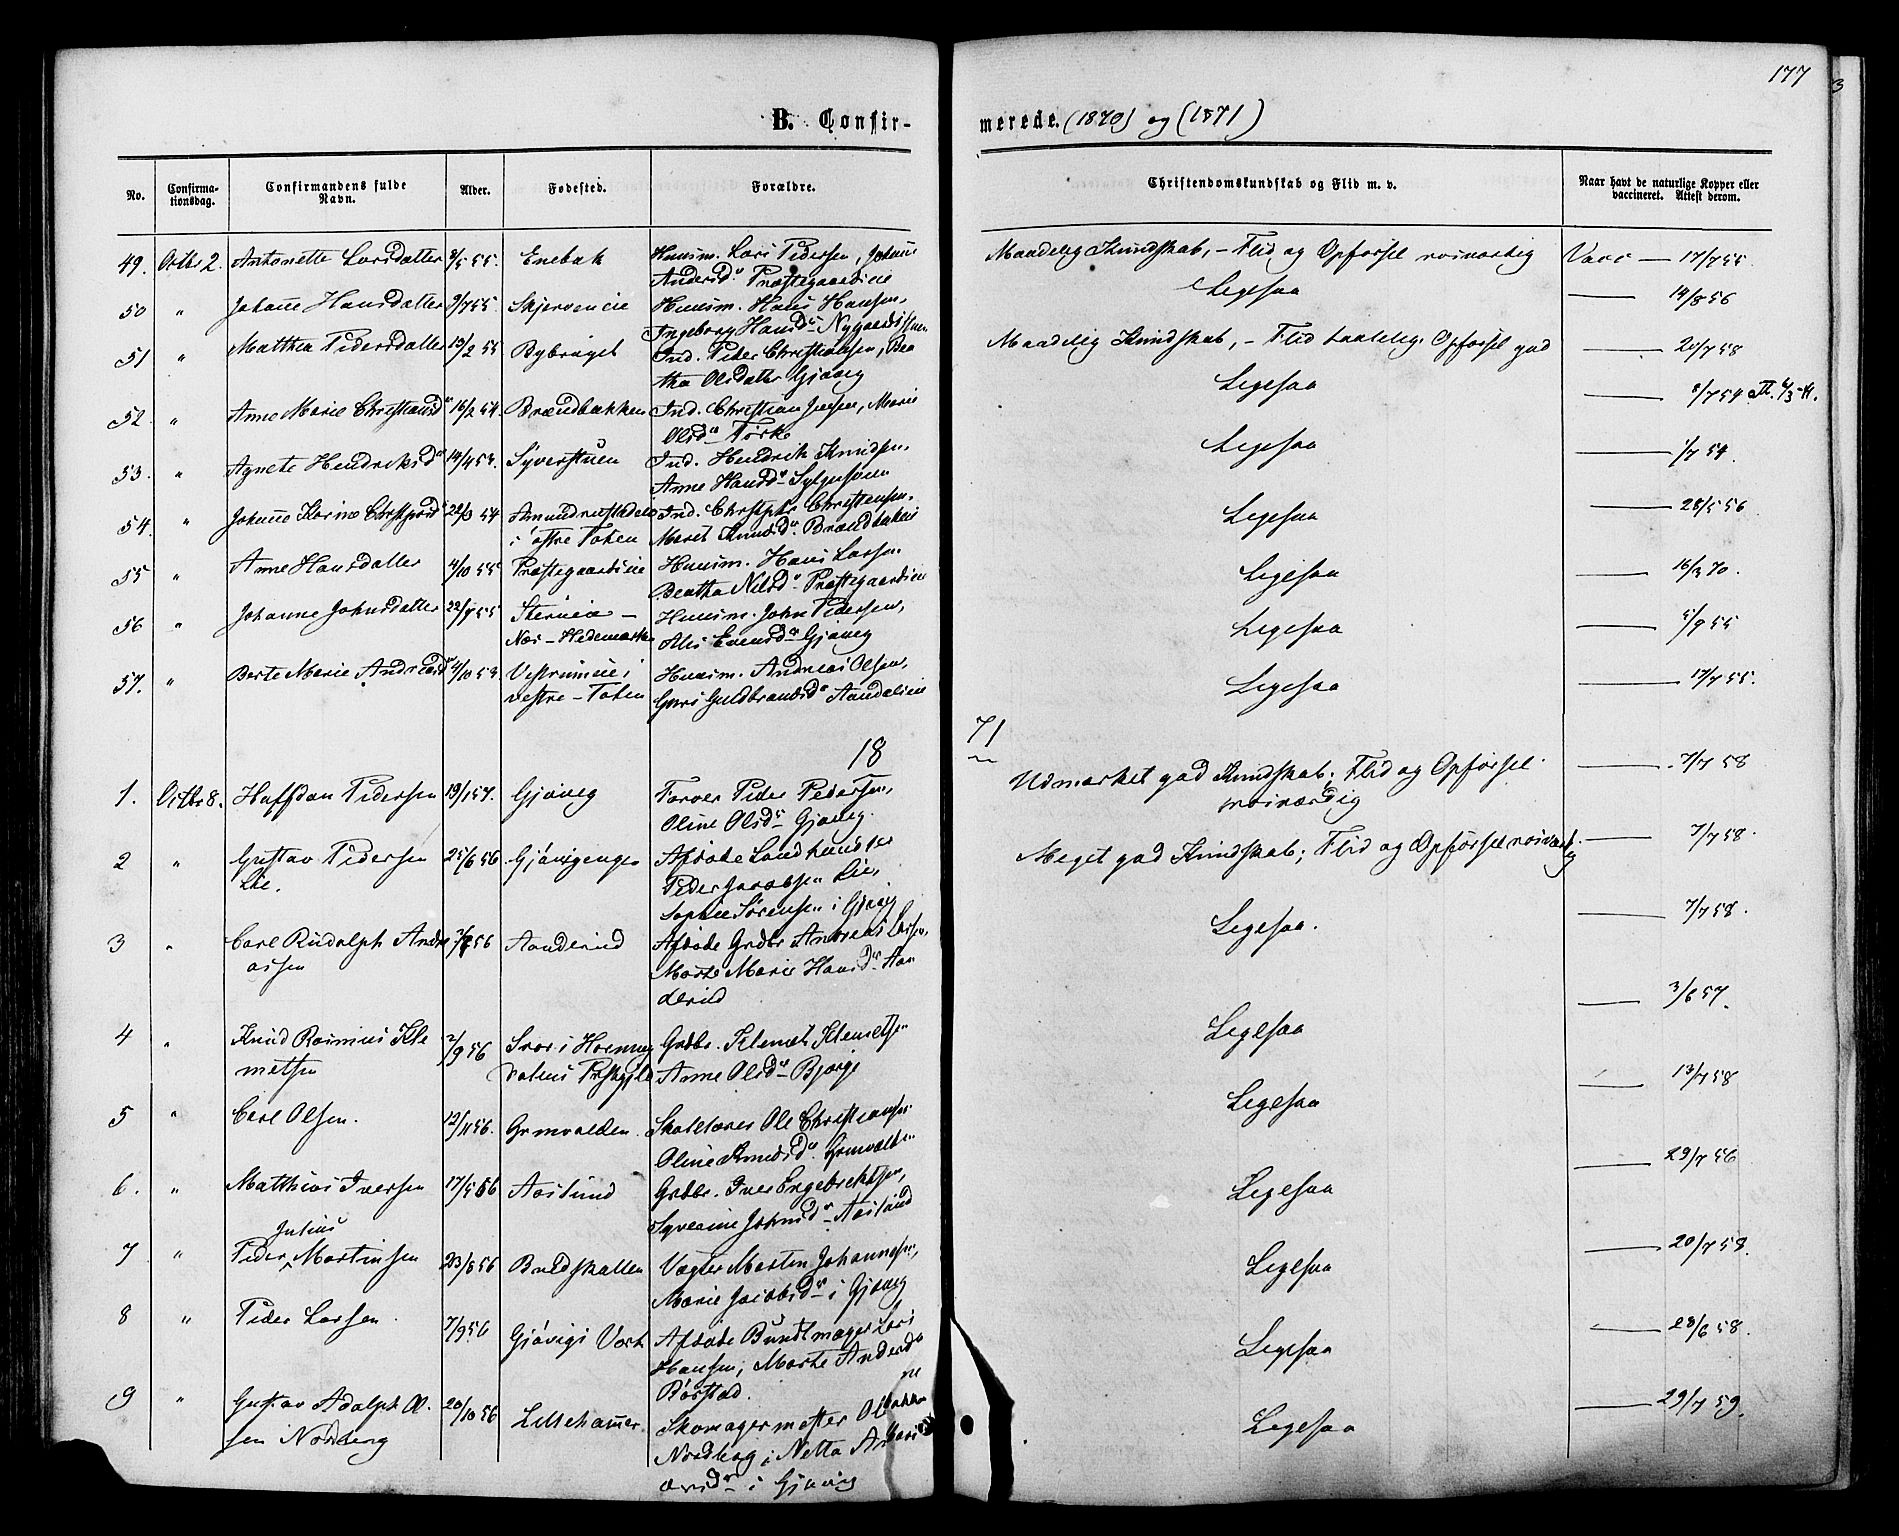 SAH, Vardal prestekontor, H/Ha/Haa/L0007: Ministerialbok nr. 7, 1867-1878, s. 177